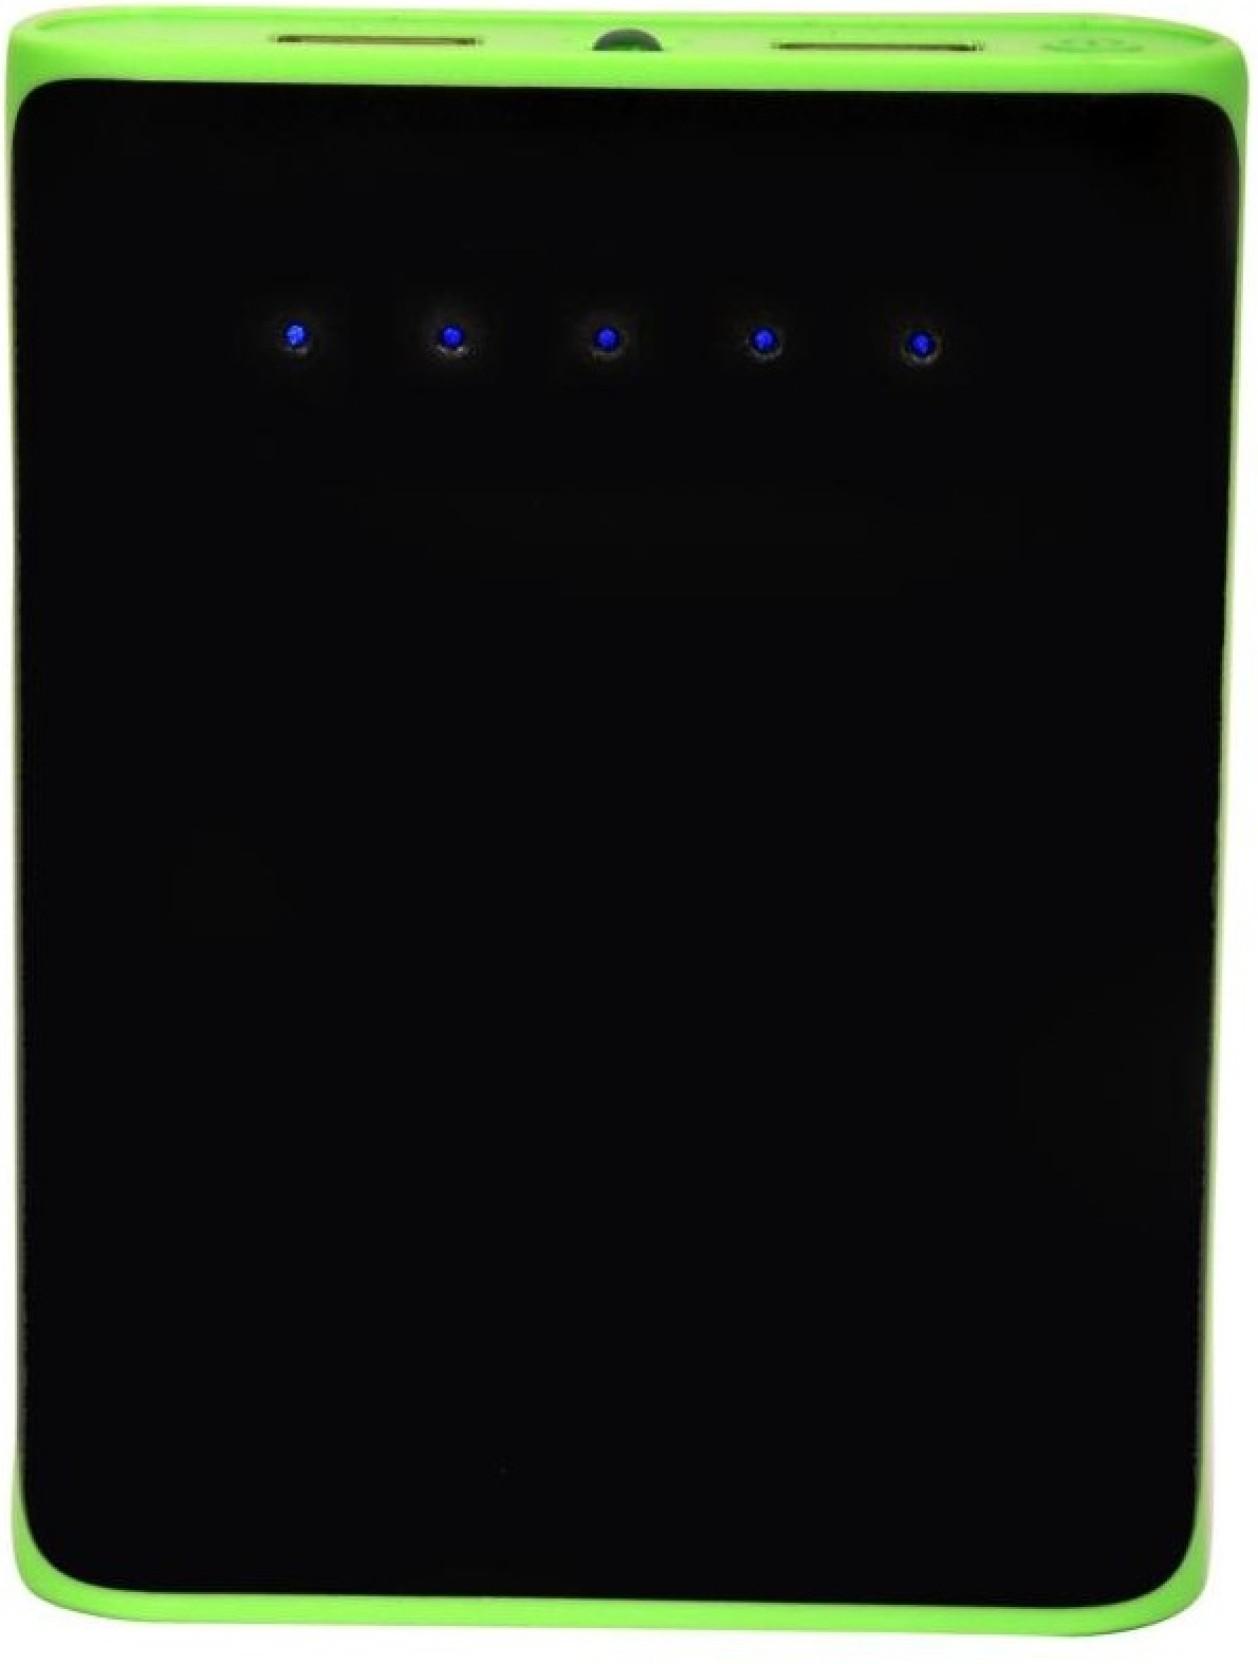 Lappymaster 12000 Mah Power Bank Stylish Dual Usb Portable Oldi Powerbank 12000mah Compare